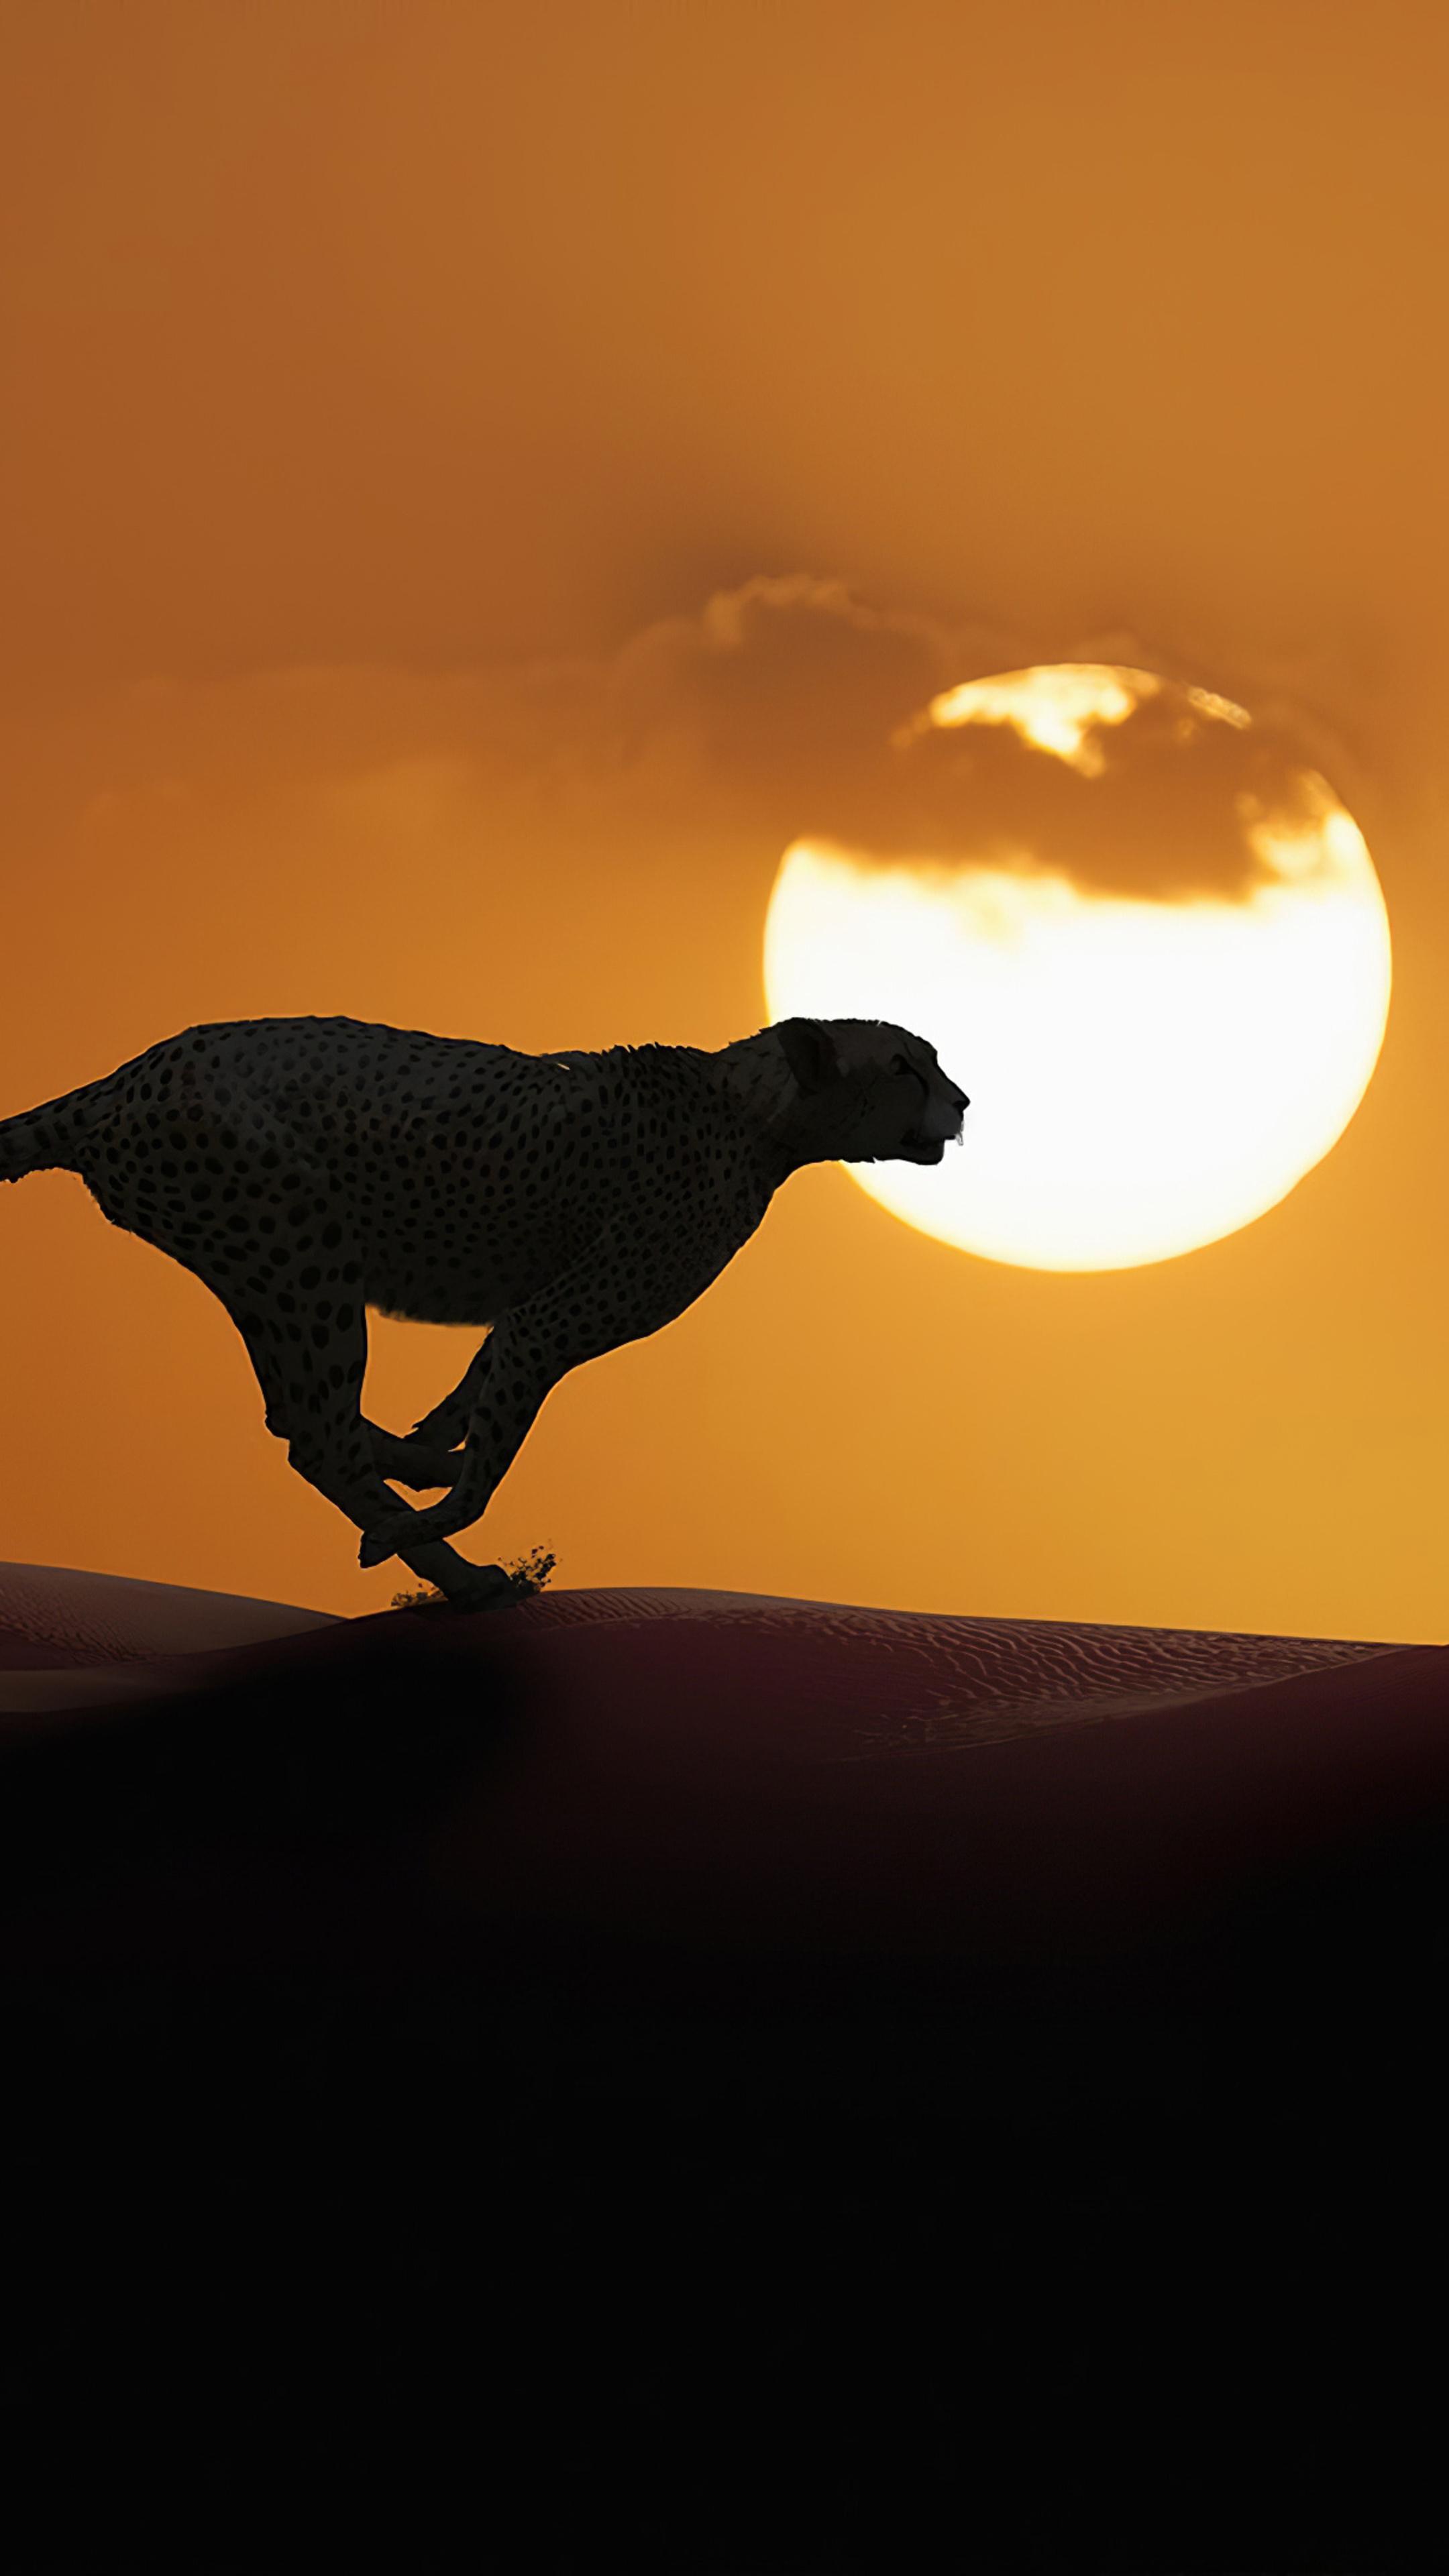 cheetah-running-4k-ax.jpg